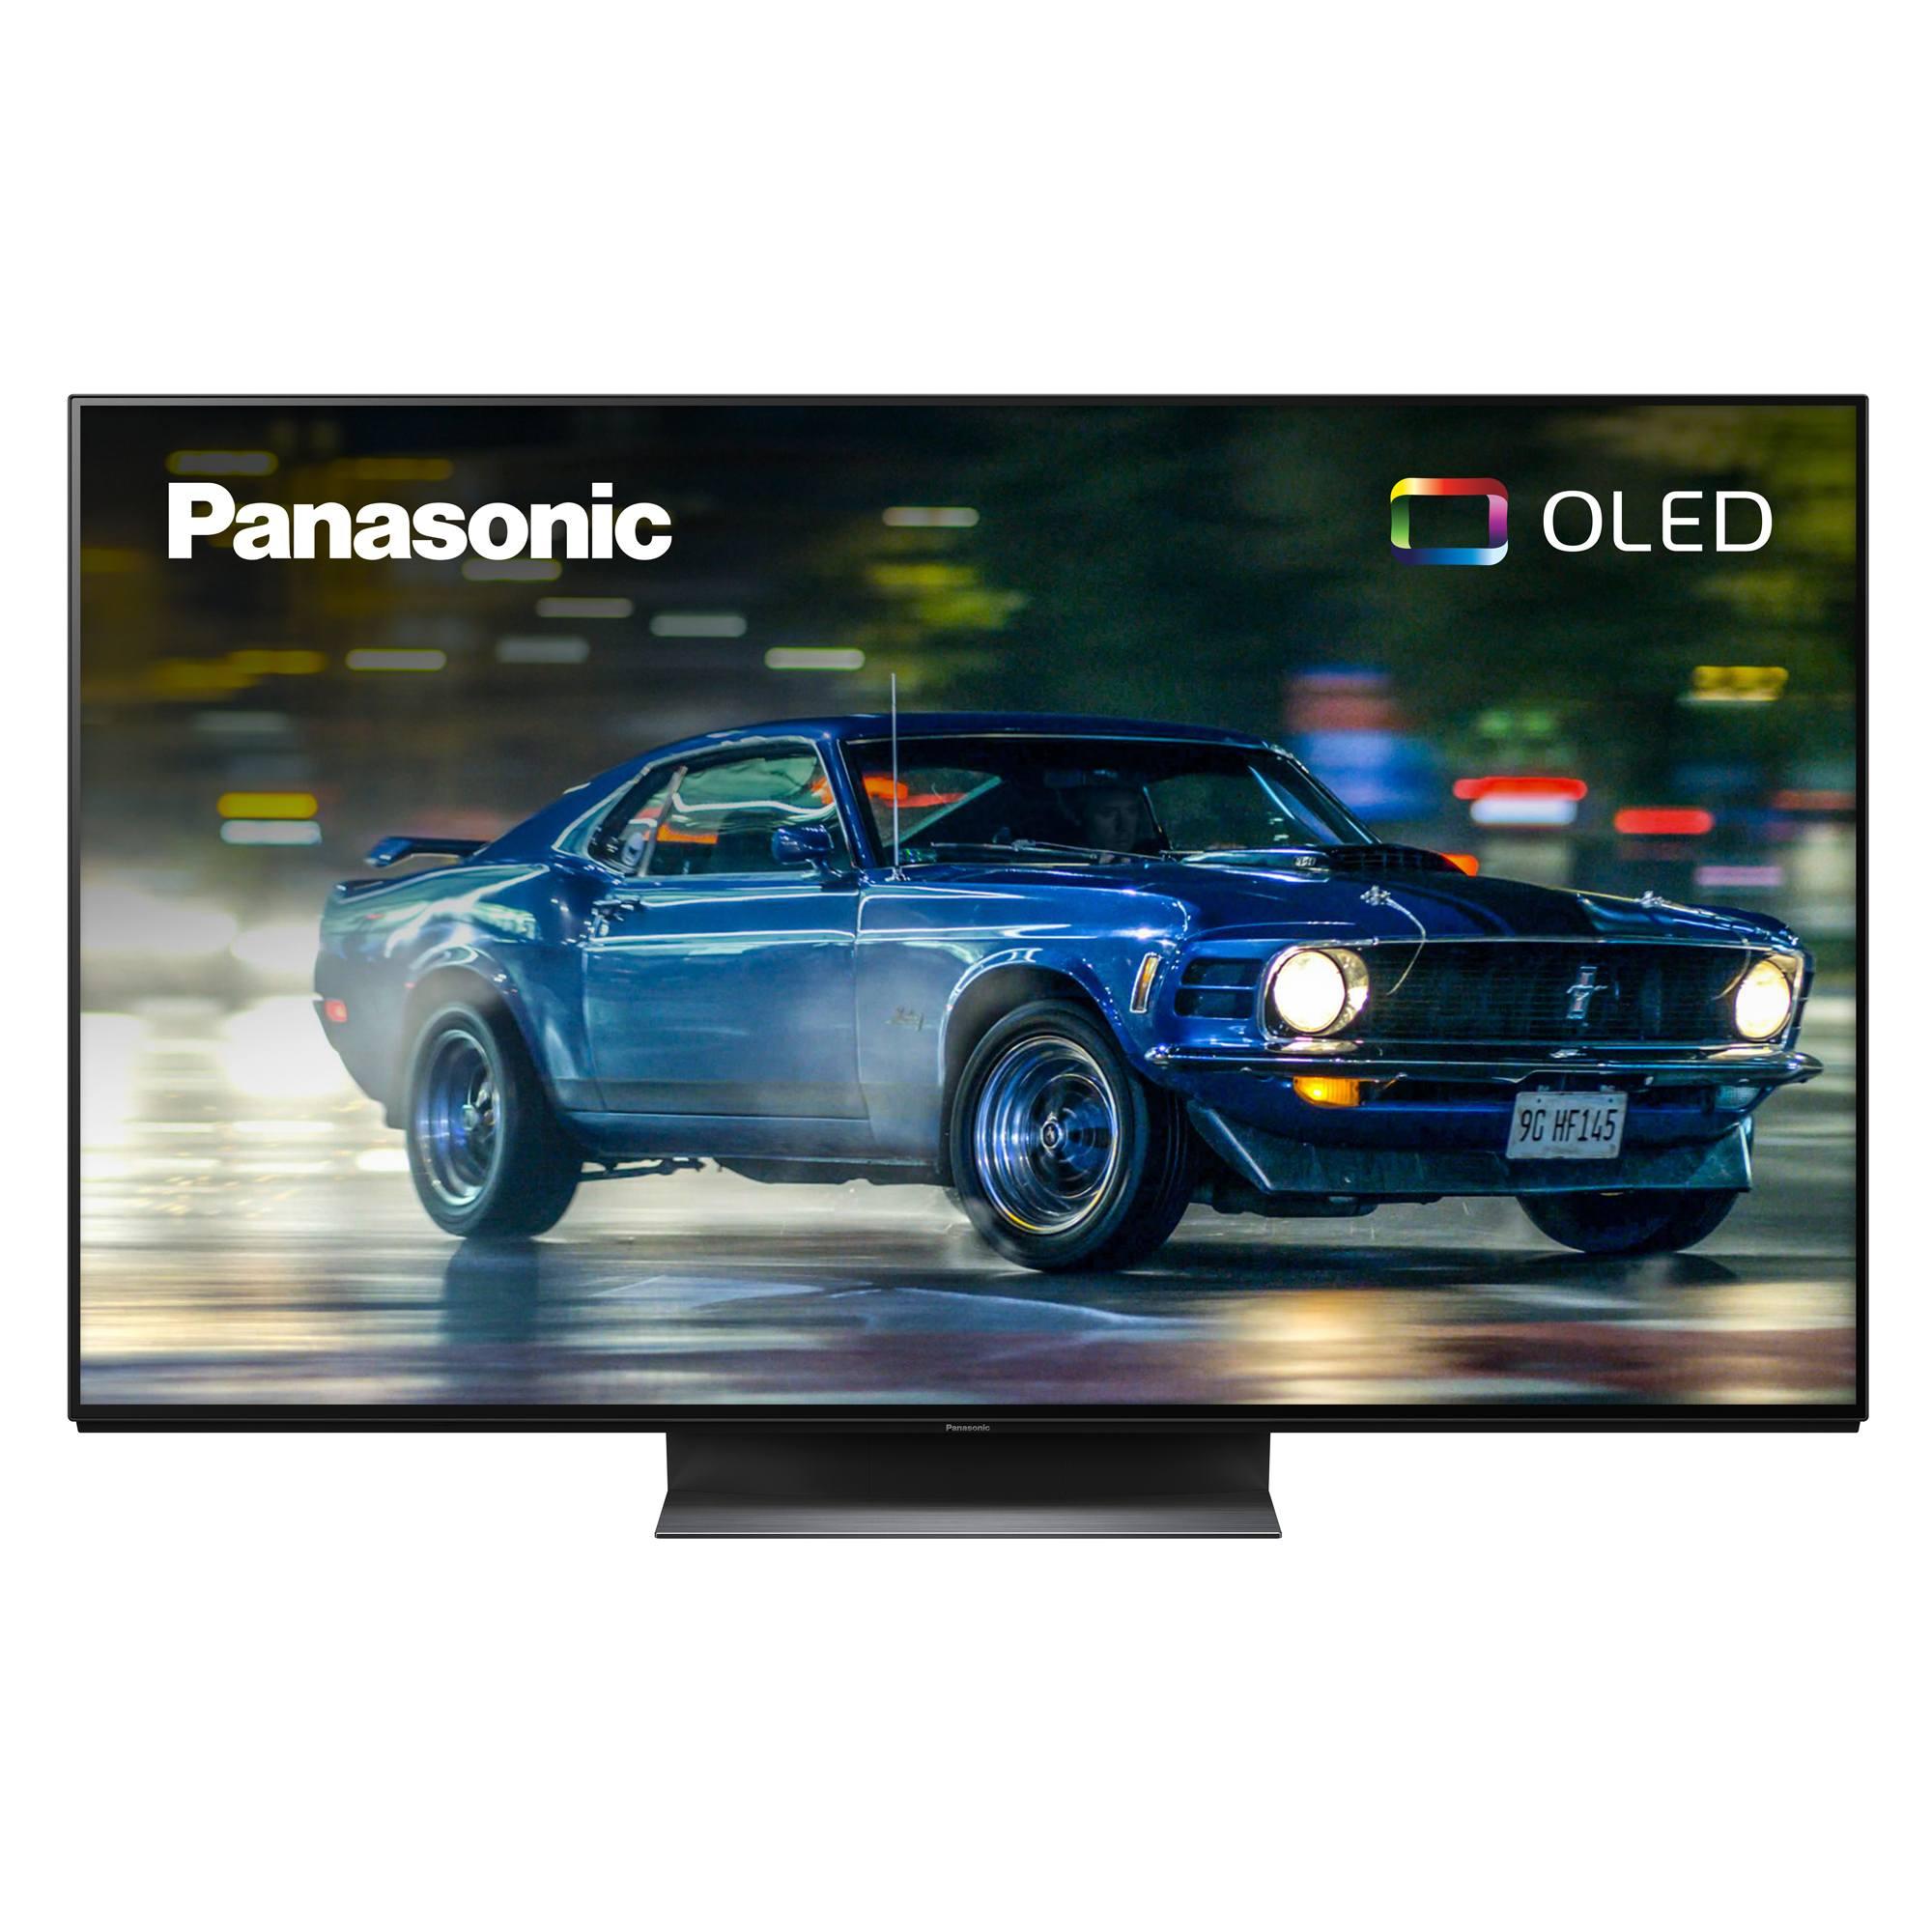 Panasonic TX-55GZ1000B 55 inch OLED 4K Ultra HD Premium Smart TV £1,209 Delivered @ Hughes